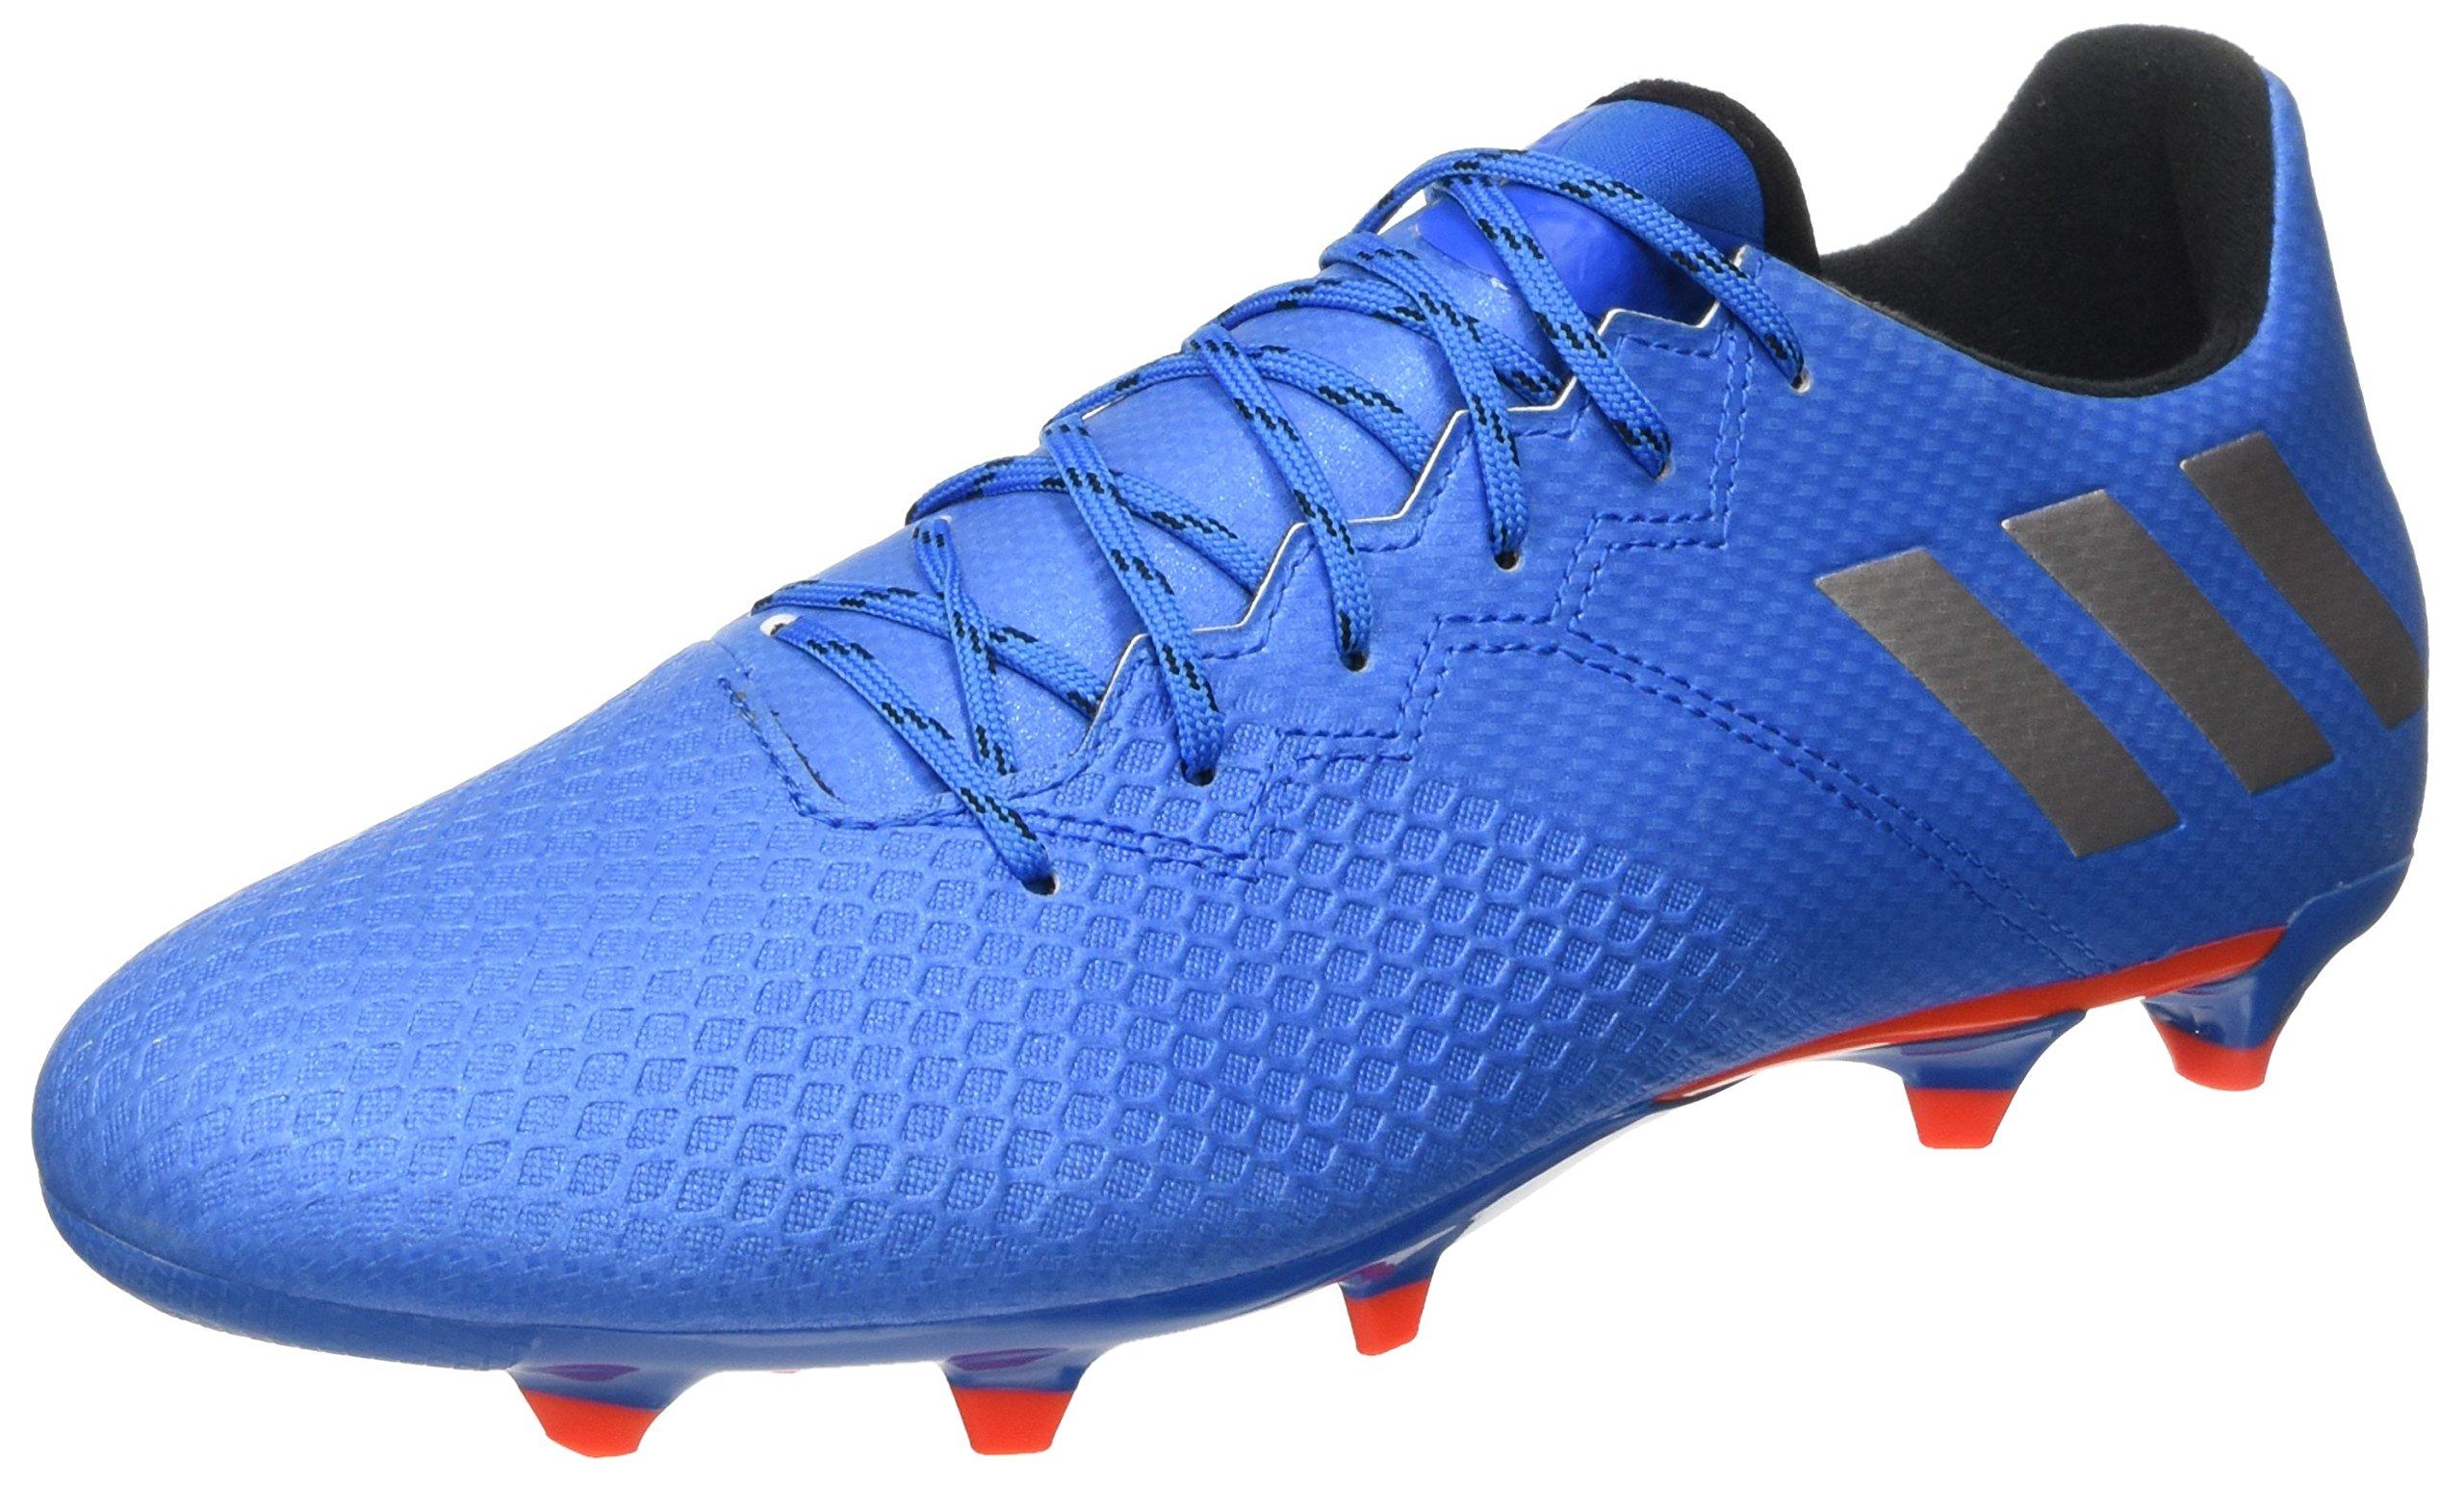 Silver Adidas core HommeBleushock 3 Black46 16 FgChaussures De Eu Messi Blue Football matte OiPuXkZ